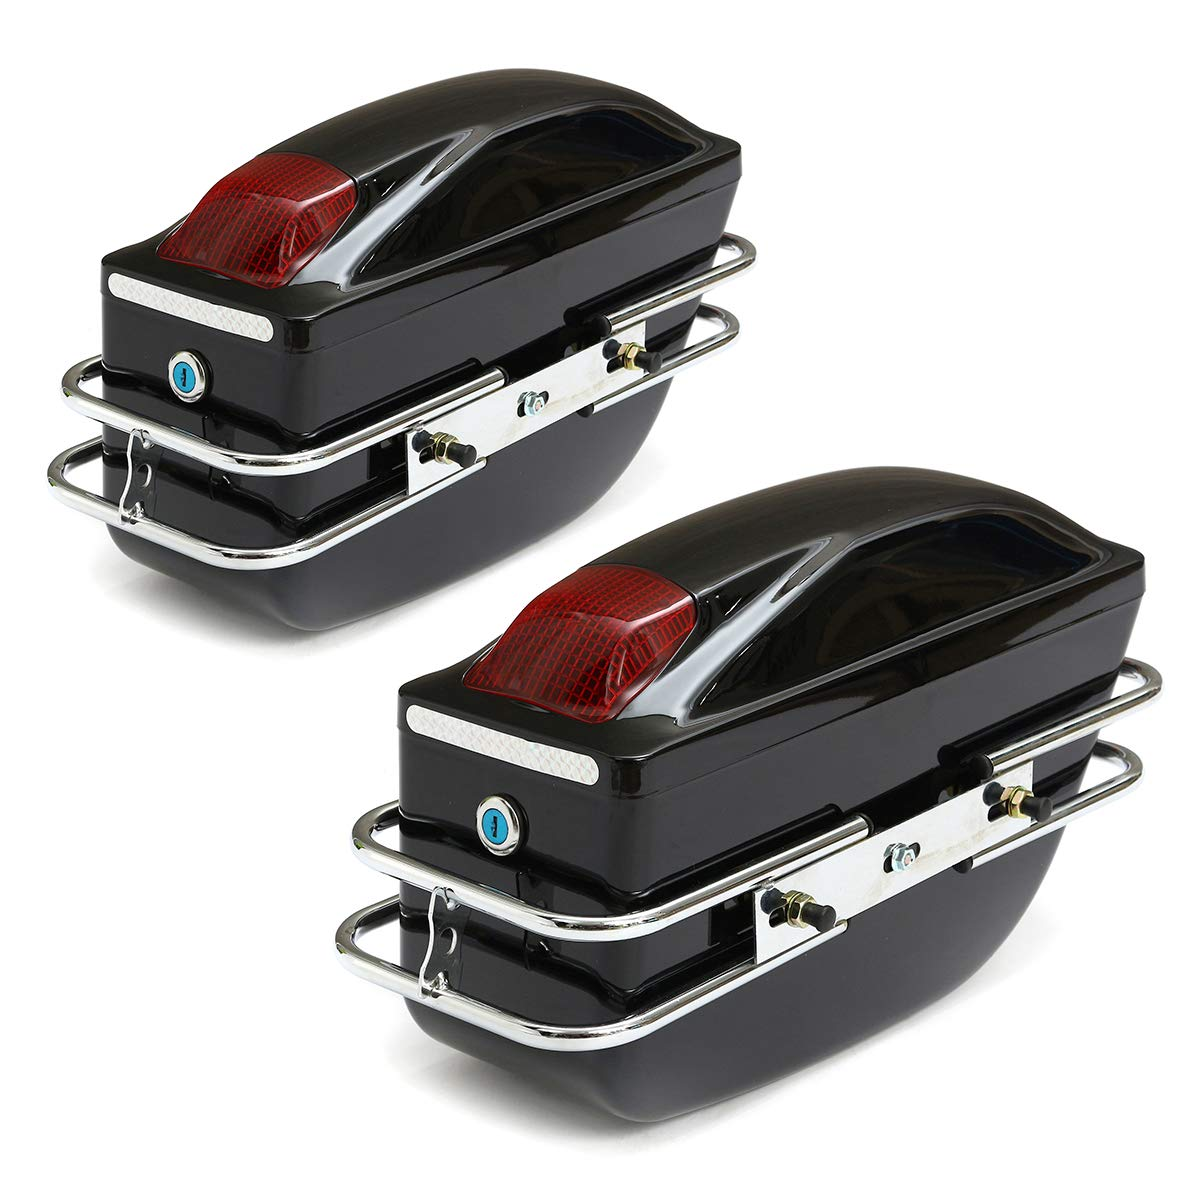 Universal Motorcycle Side Boxes Luggage Bag Tank Hard Case Saddle Bags Cruiser Light Black